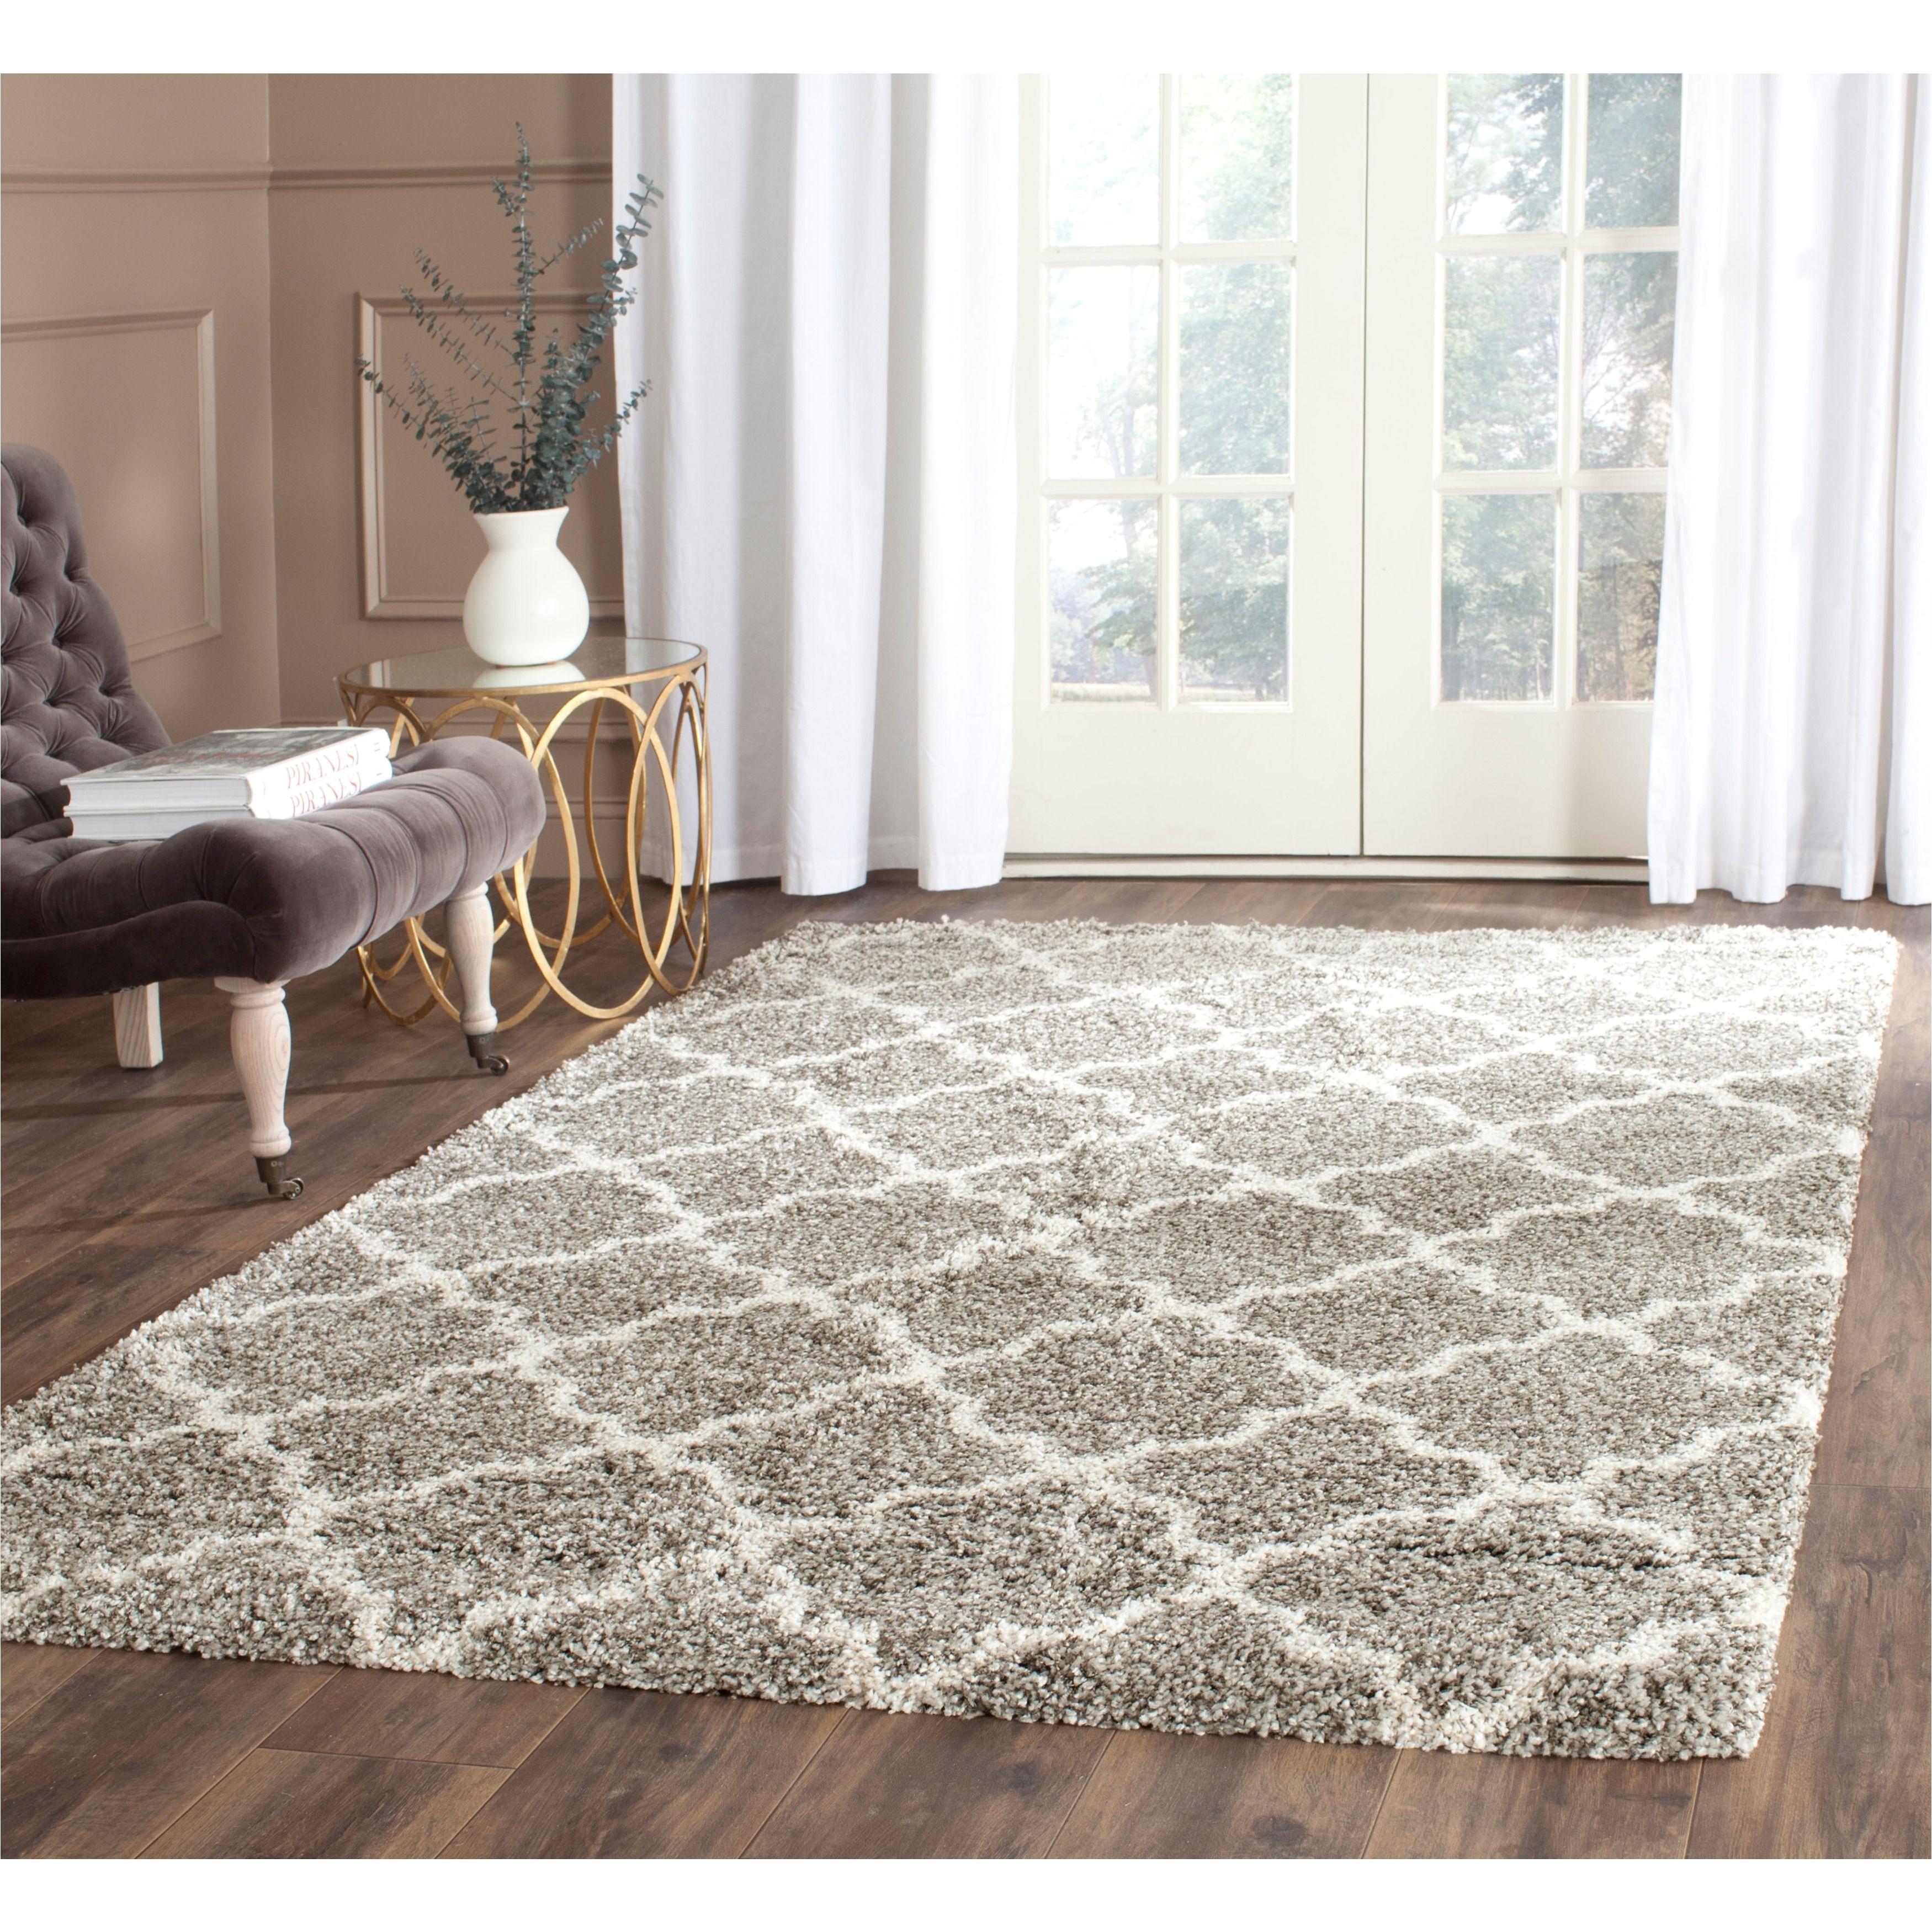 safavieh hudson quatrefoil shag grey ivory rug 7 square sgh282b 7sq size 7 x 7 polypropylene trellis